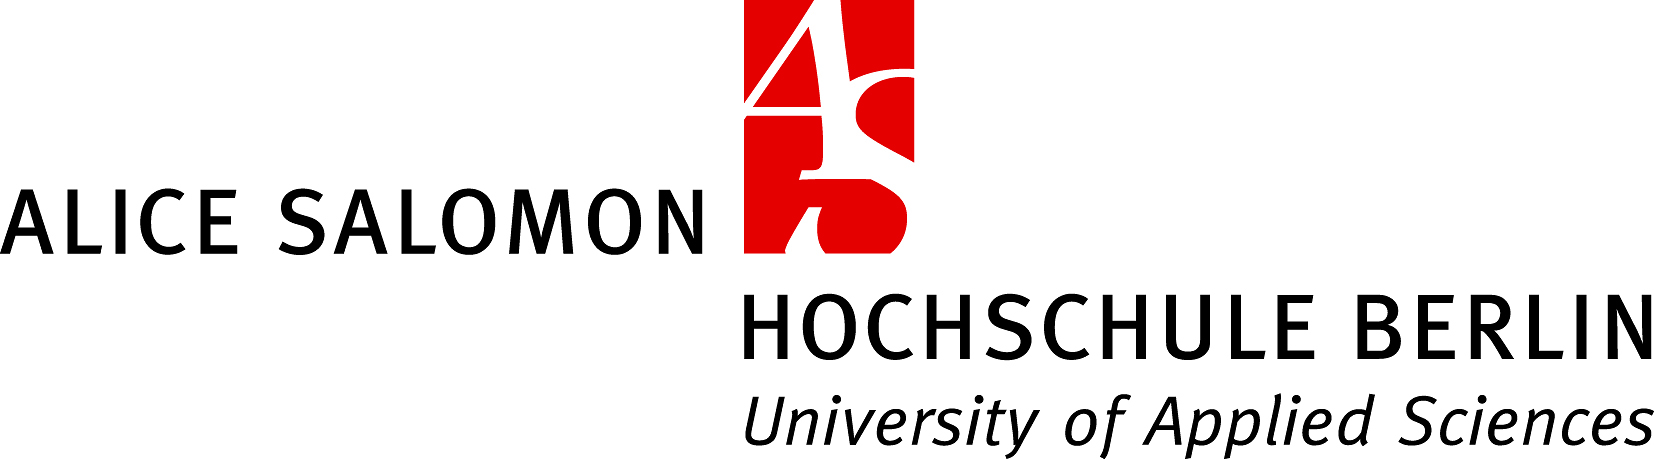 Logo Alice Salomon Hochschule Berlin